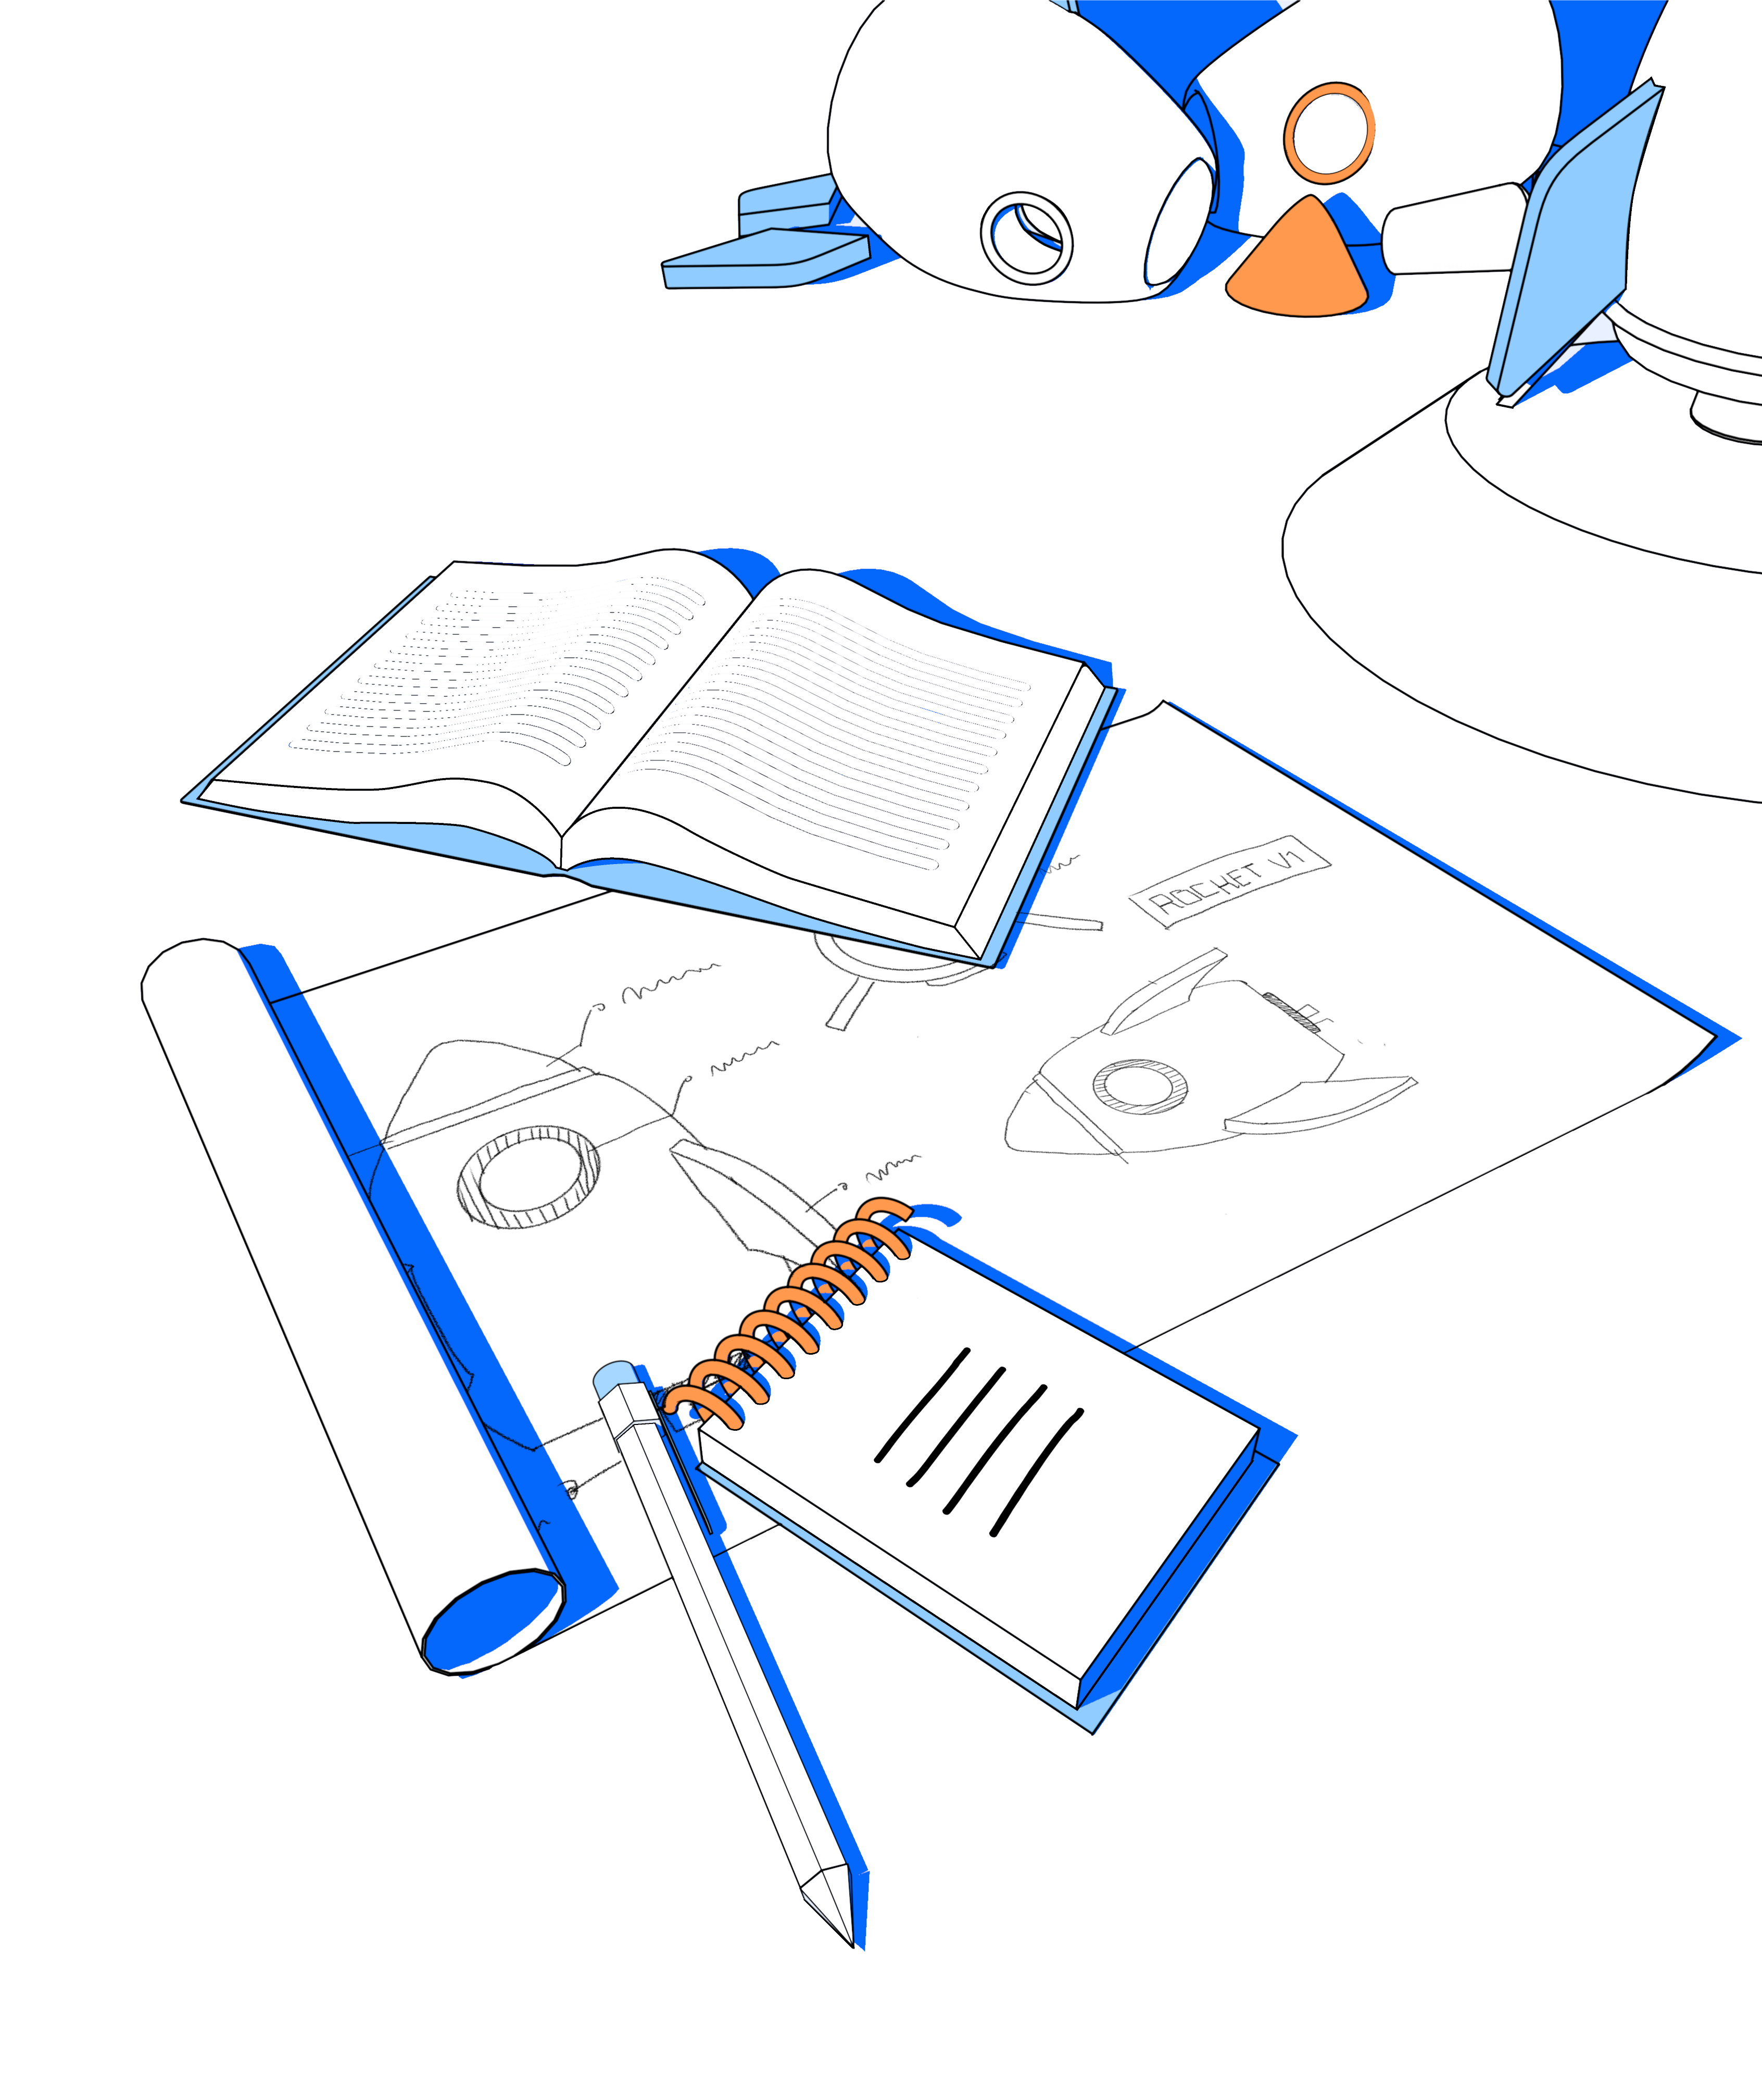 maze-product-development-process-cover